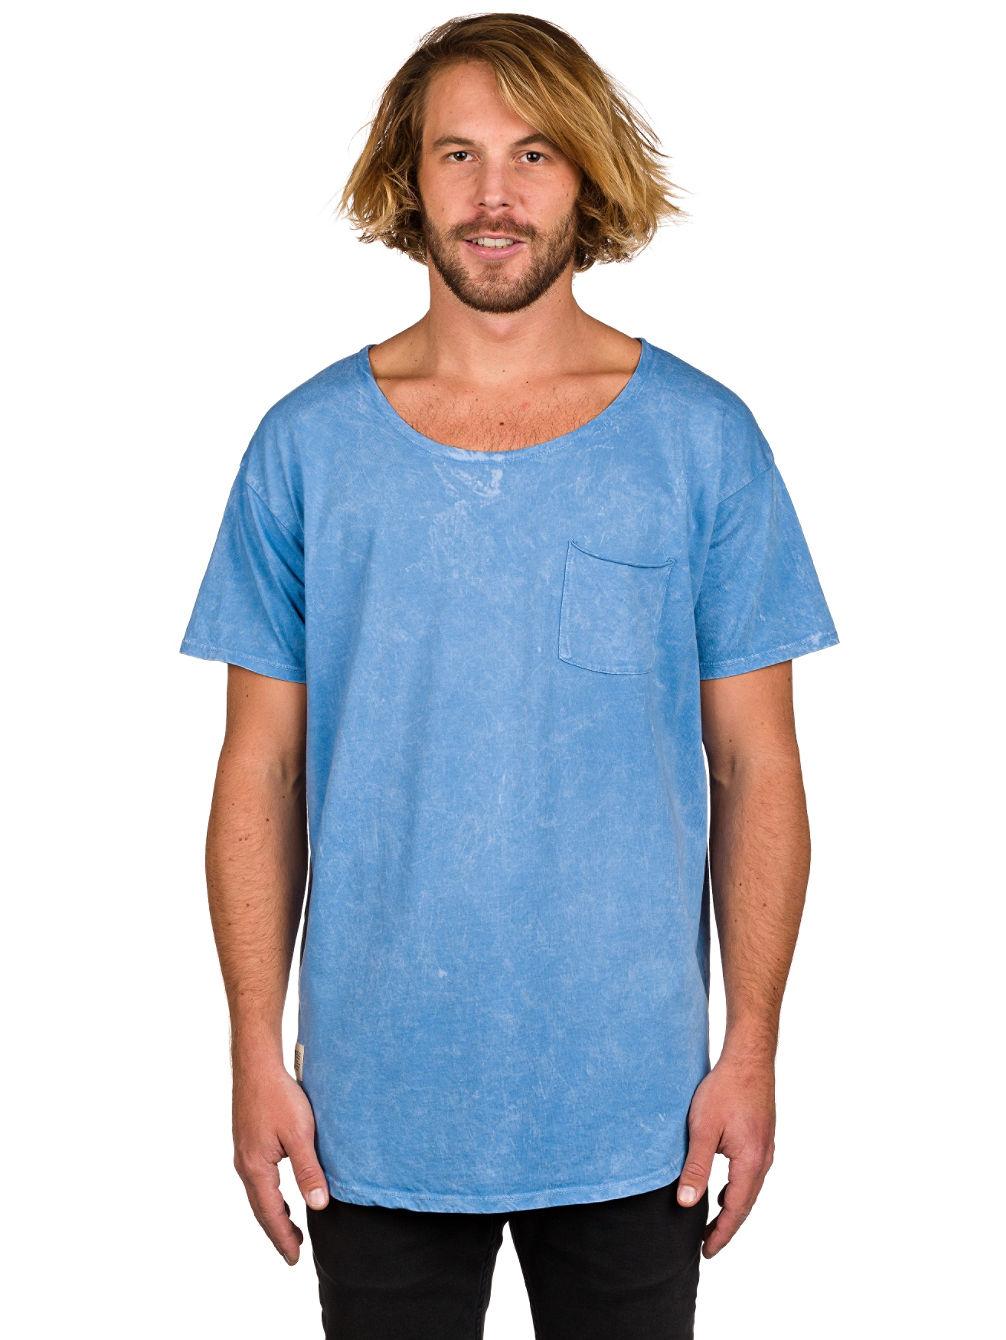 perth-t-shirt